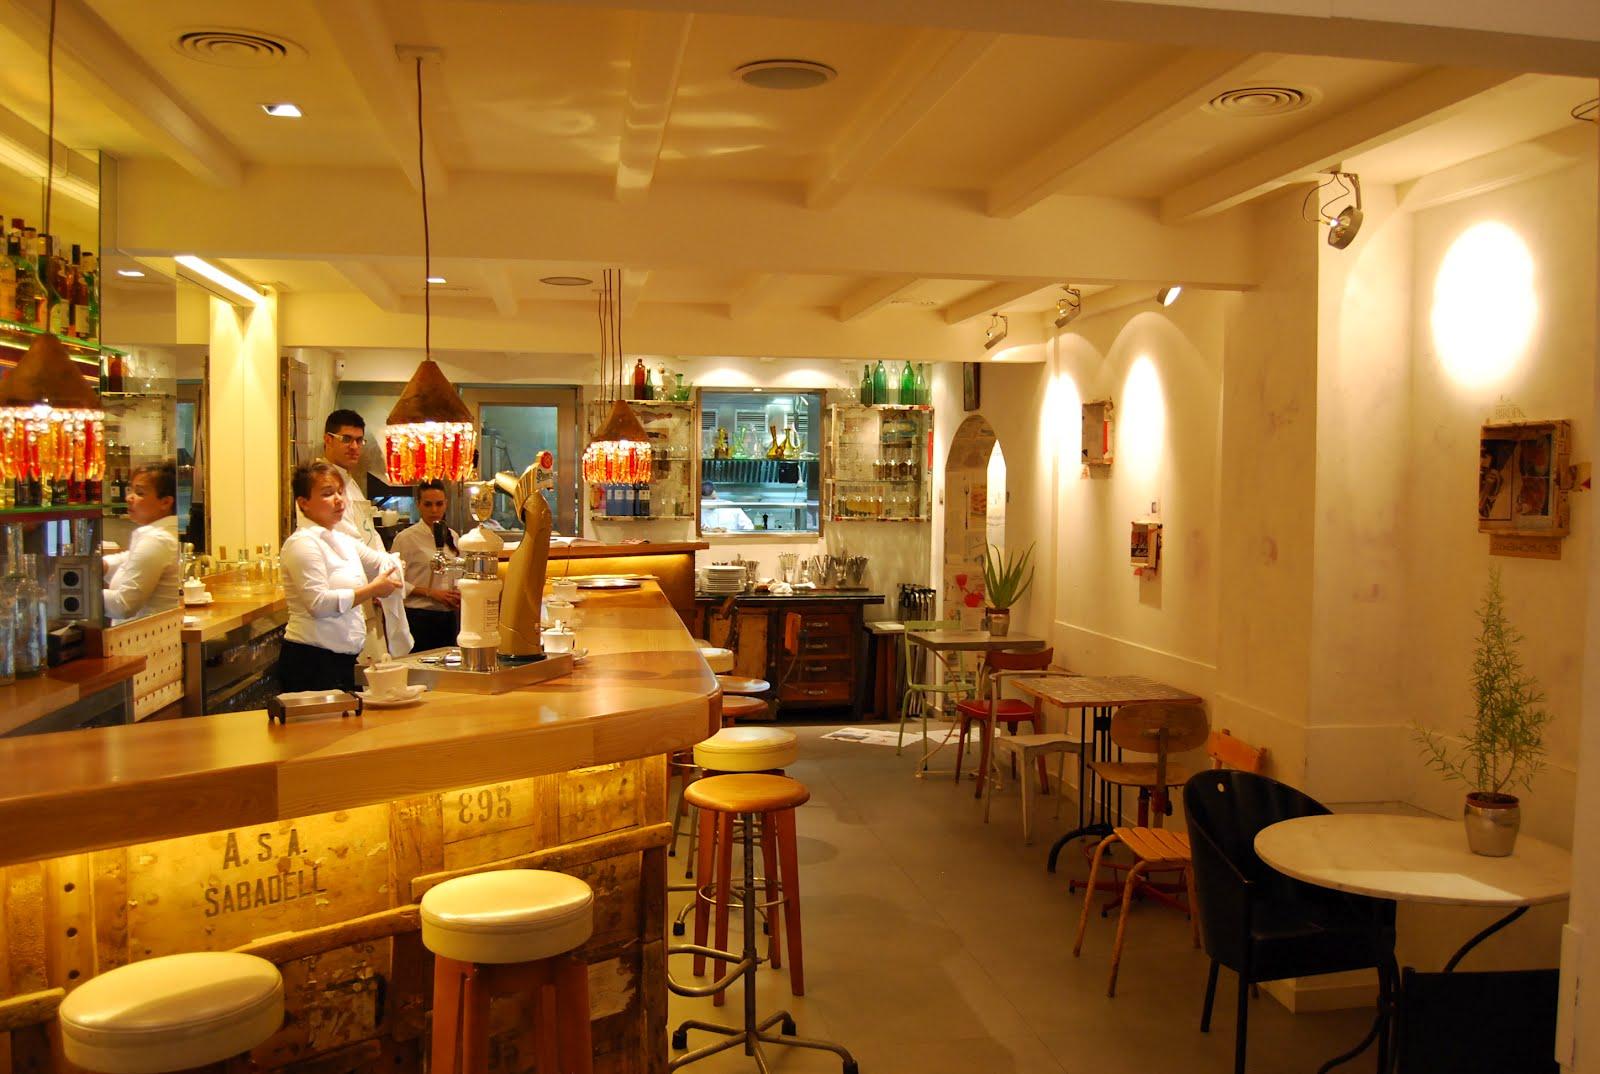 Restaurant Nonono